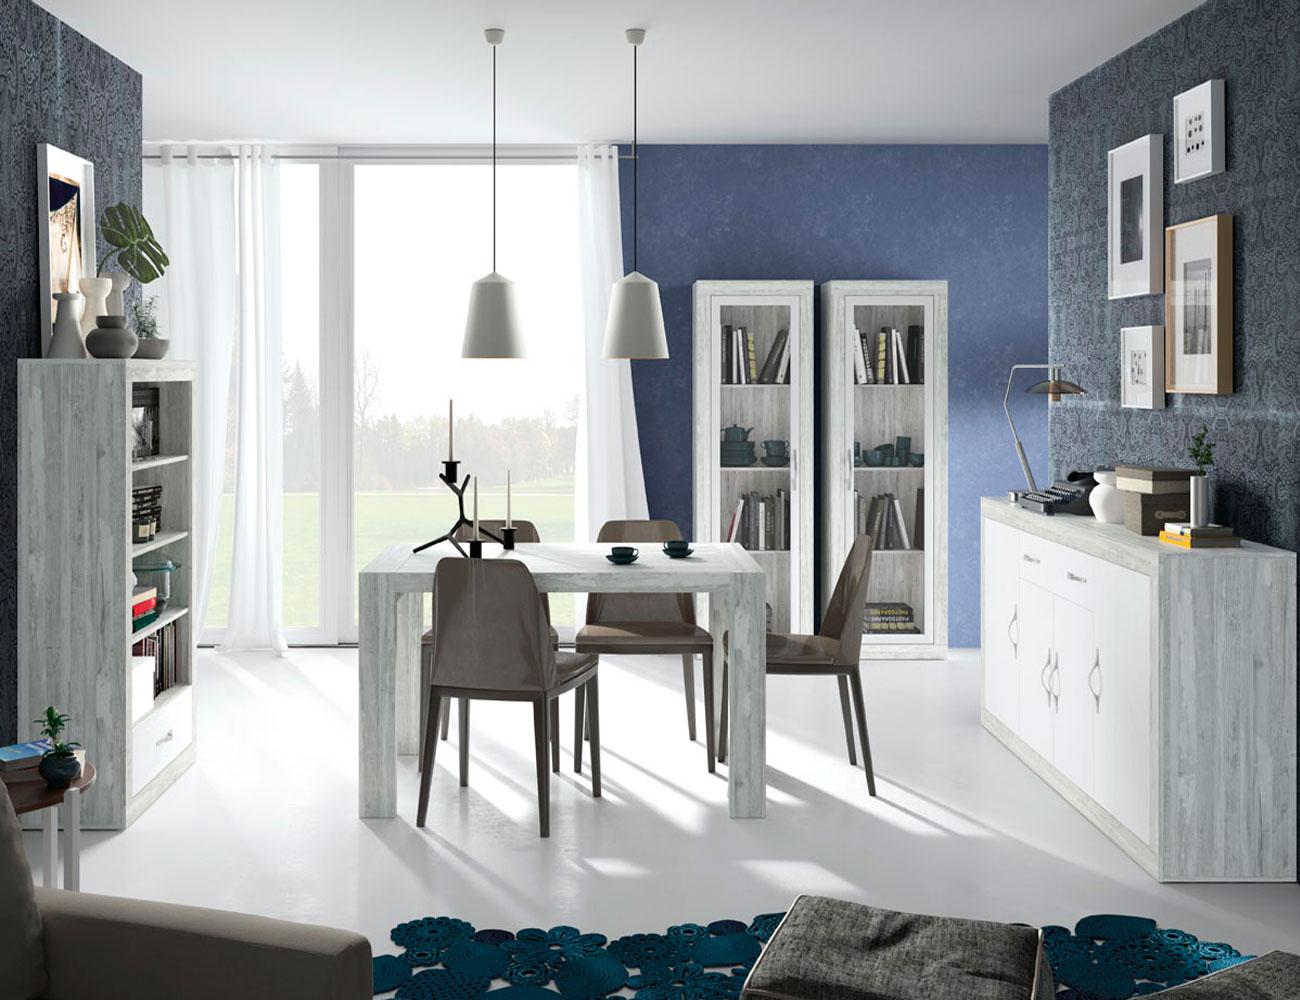 144 mueble salon comedor vitrina aparador estanteria mesa artic soul blanco